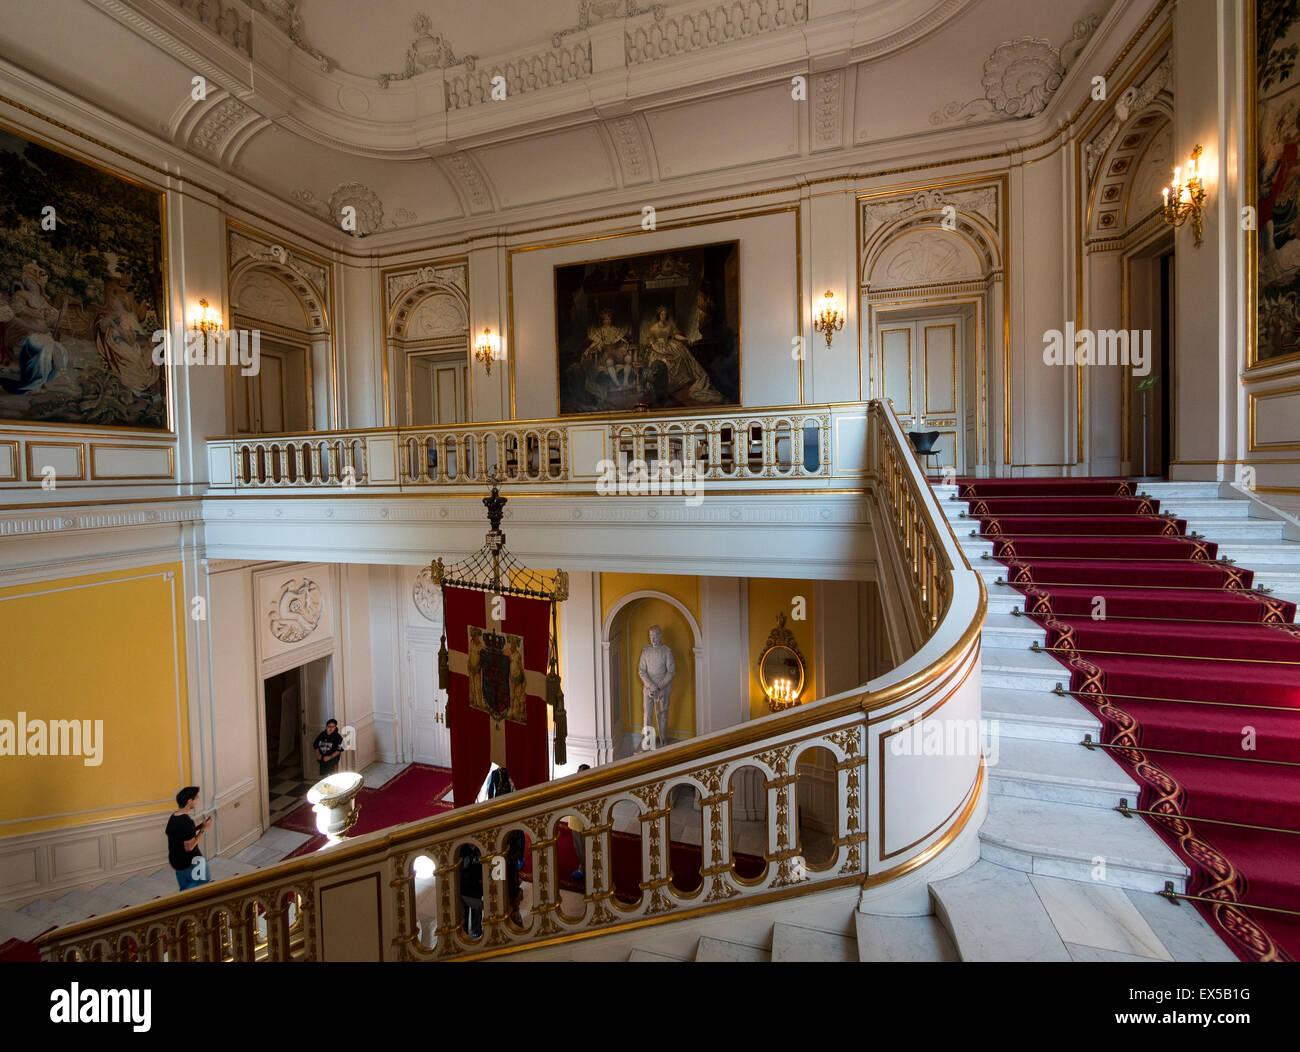 Amalienborg Interior The interior of Christ...